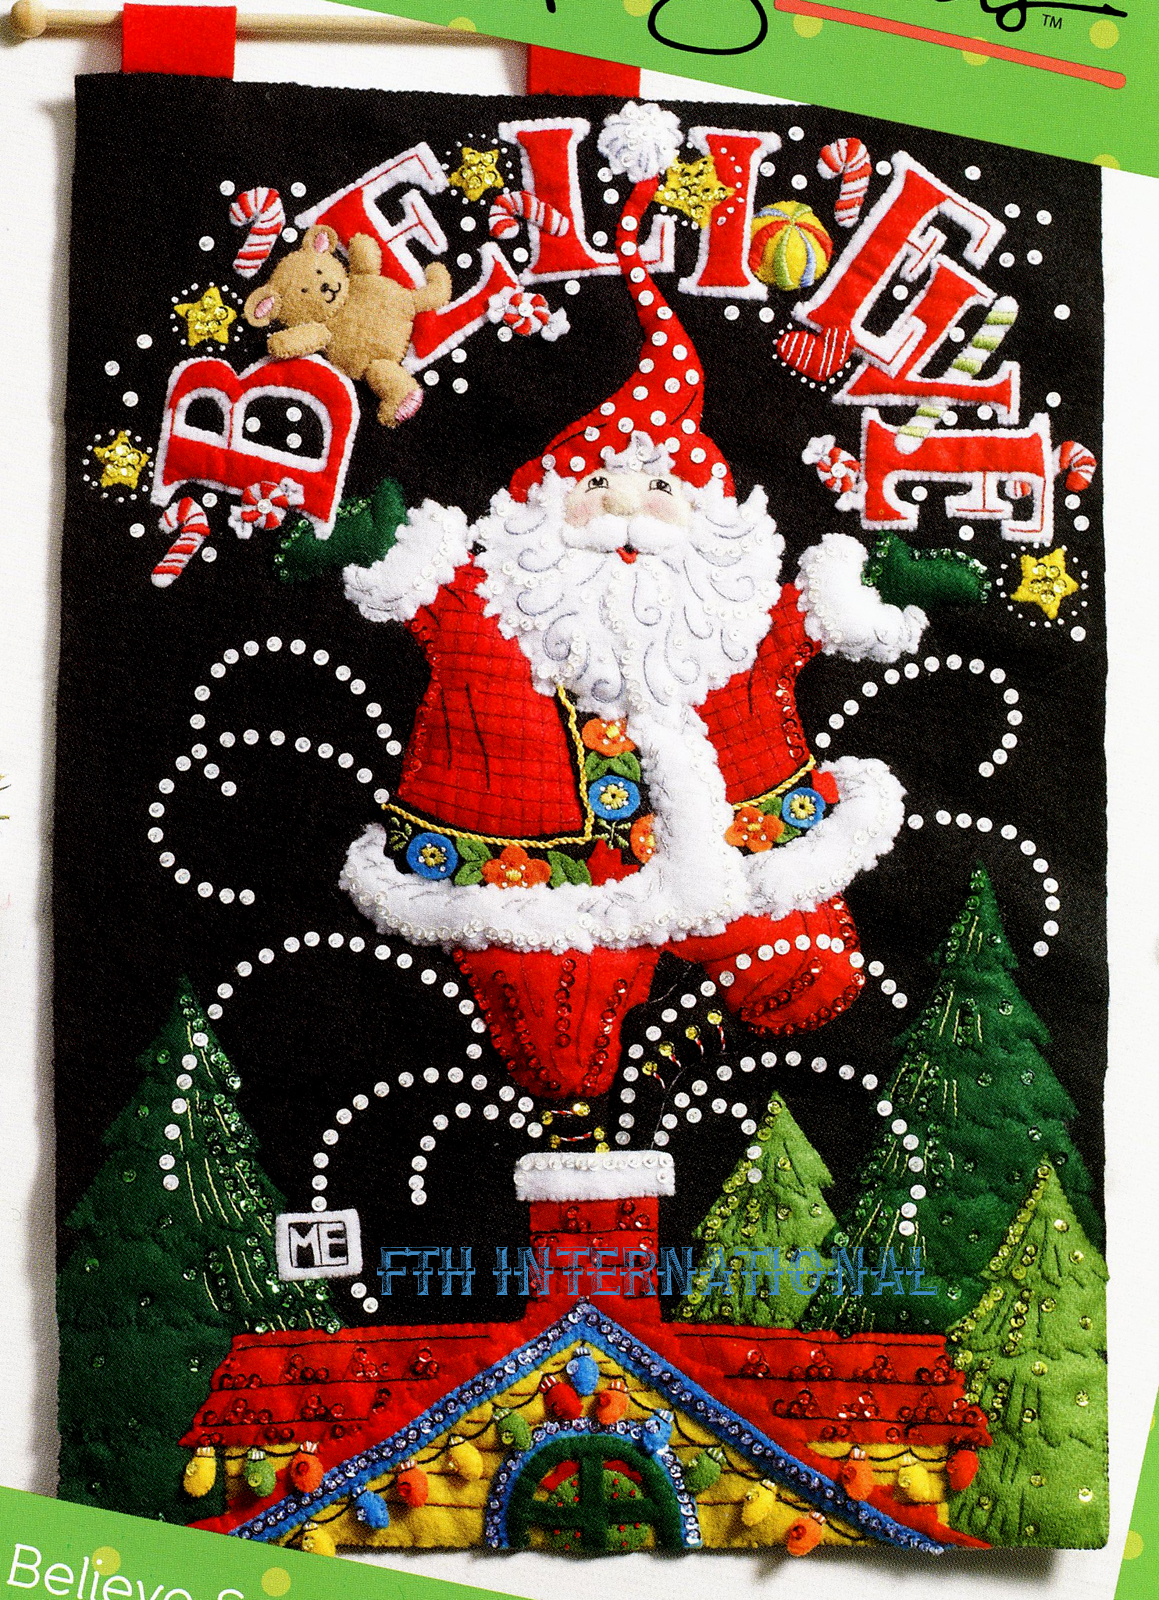 Believe Santa Bucilla Felt Christmas Wall Hanging Kit